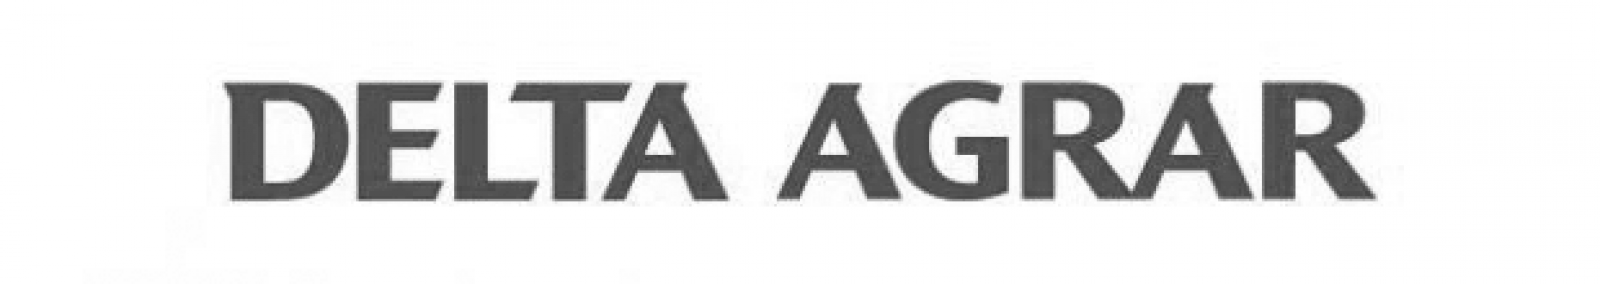 Bilbord za kompaniju Delta Agrar